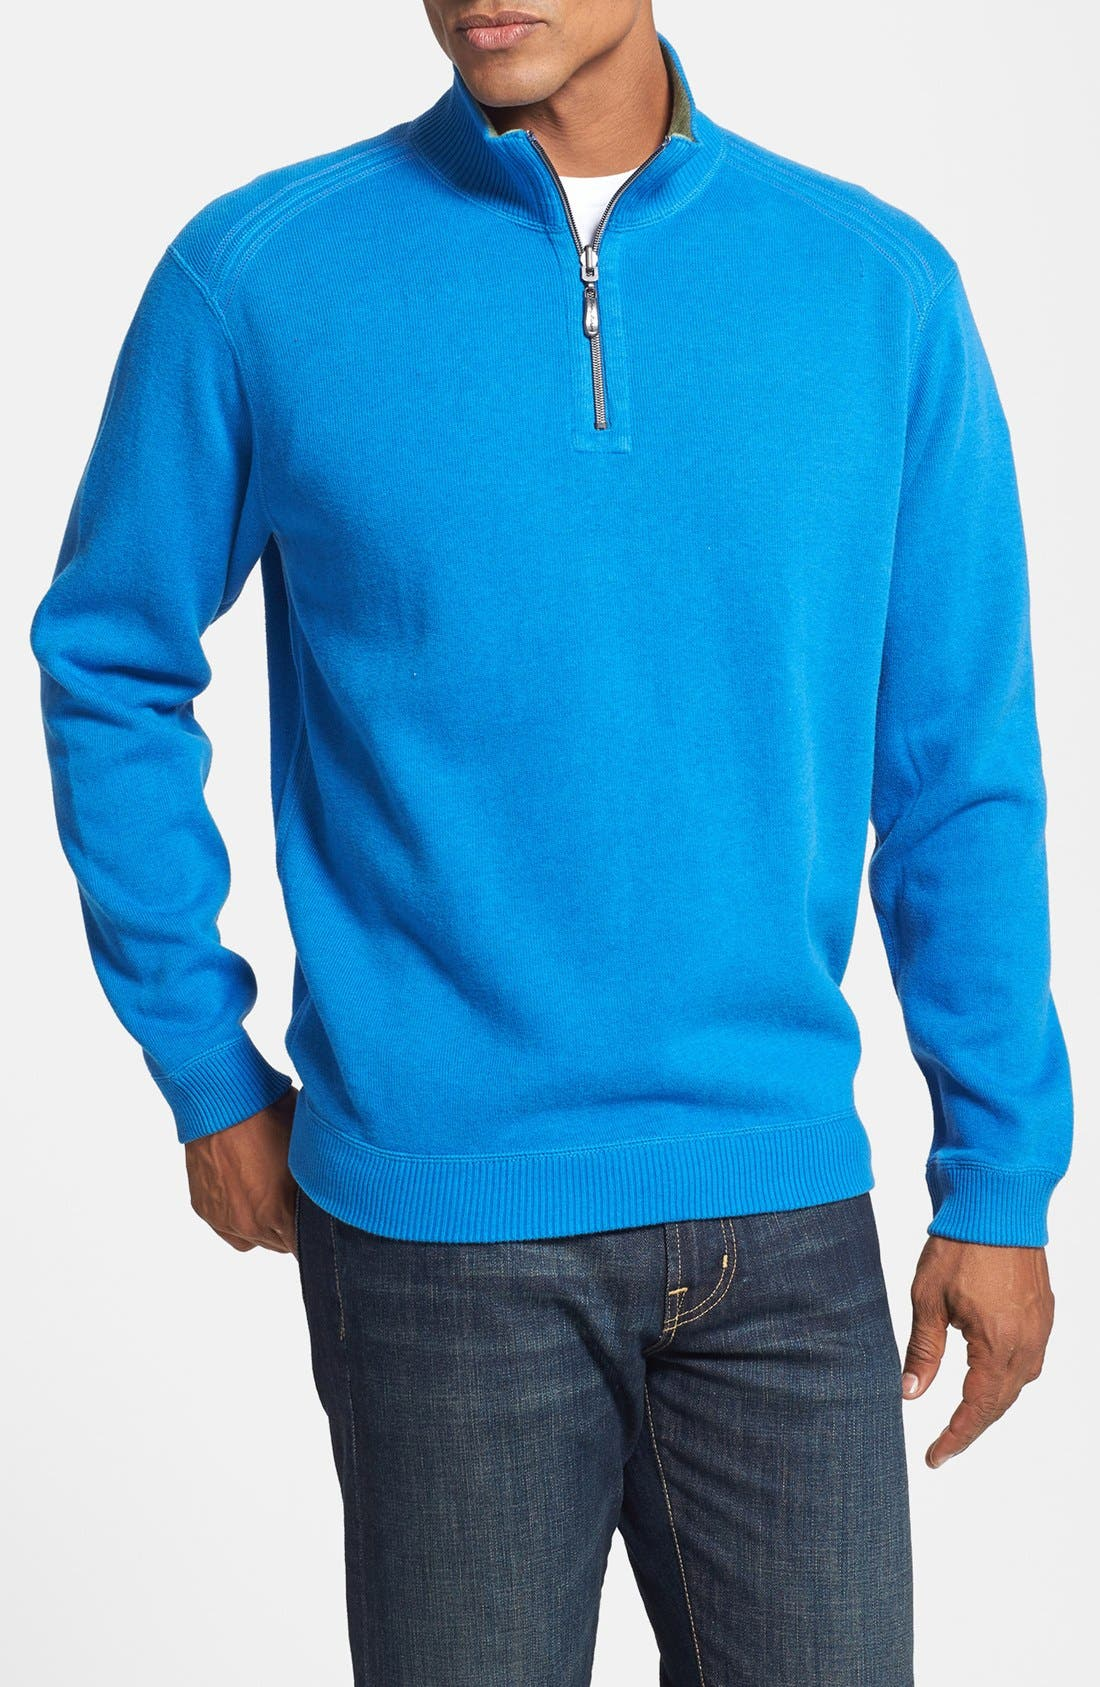 Alternate Image 1 Selected - Tommy Bahama 'Flip Side Pro' Reversible Half Zip Pullover